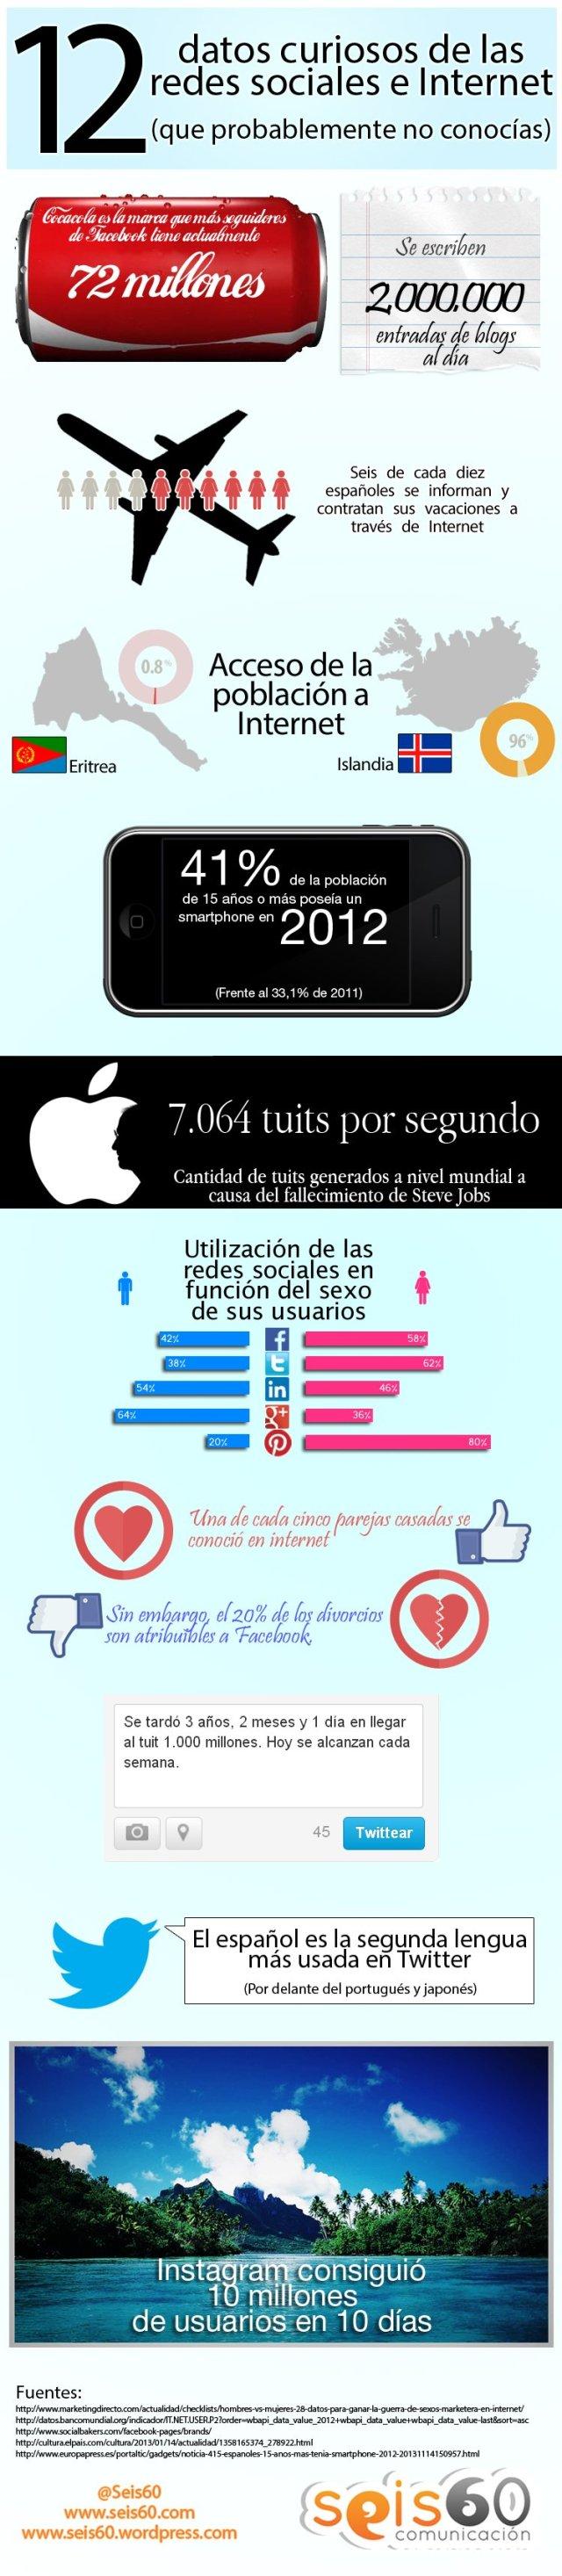 12 datos curiosos sobre Redes Sociales e Internet